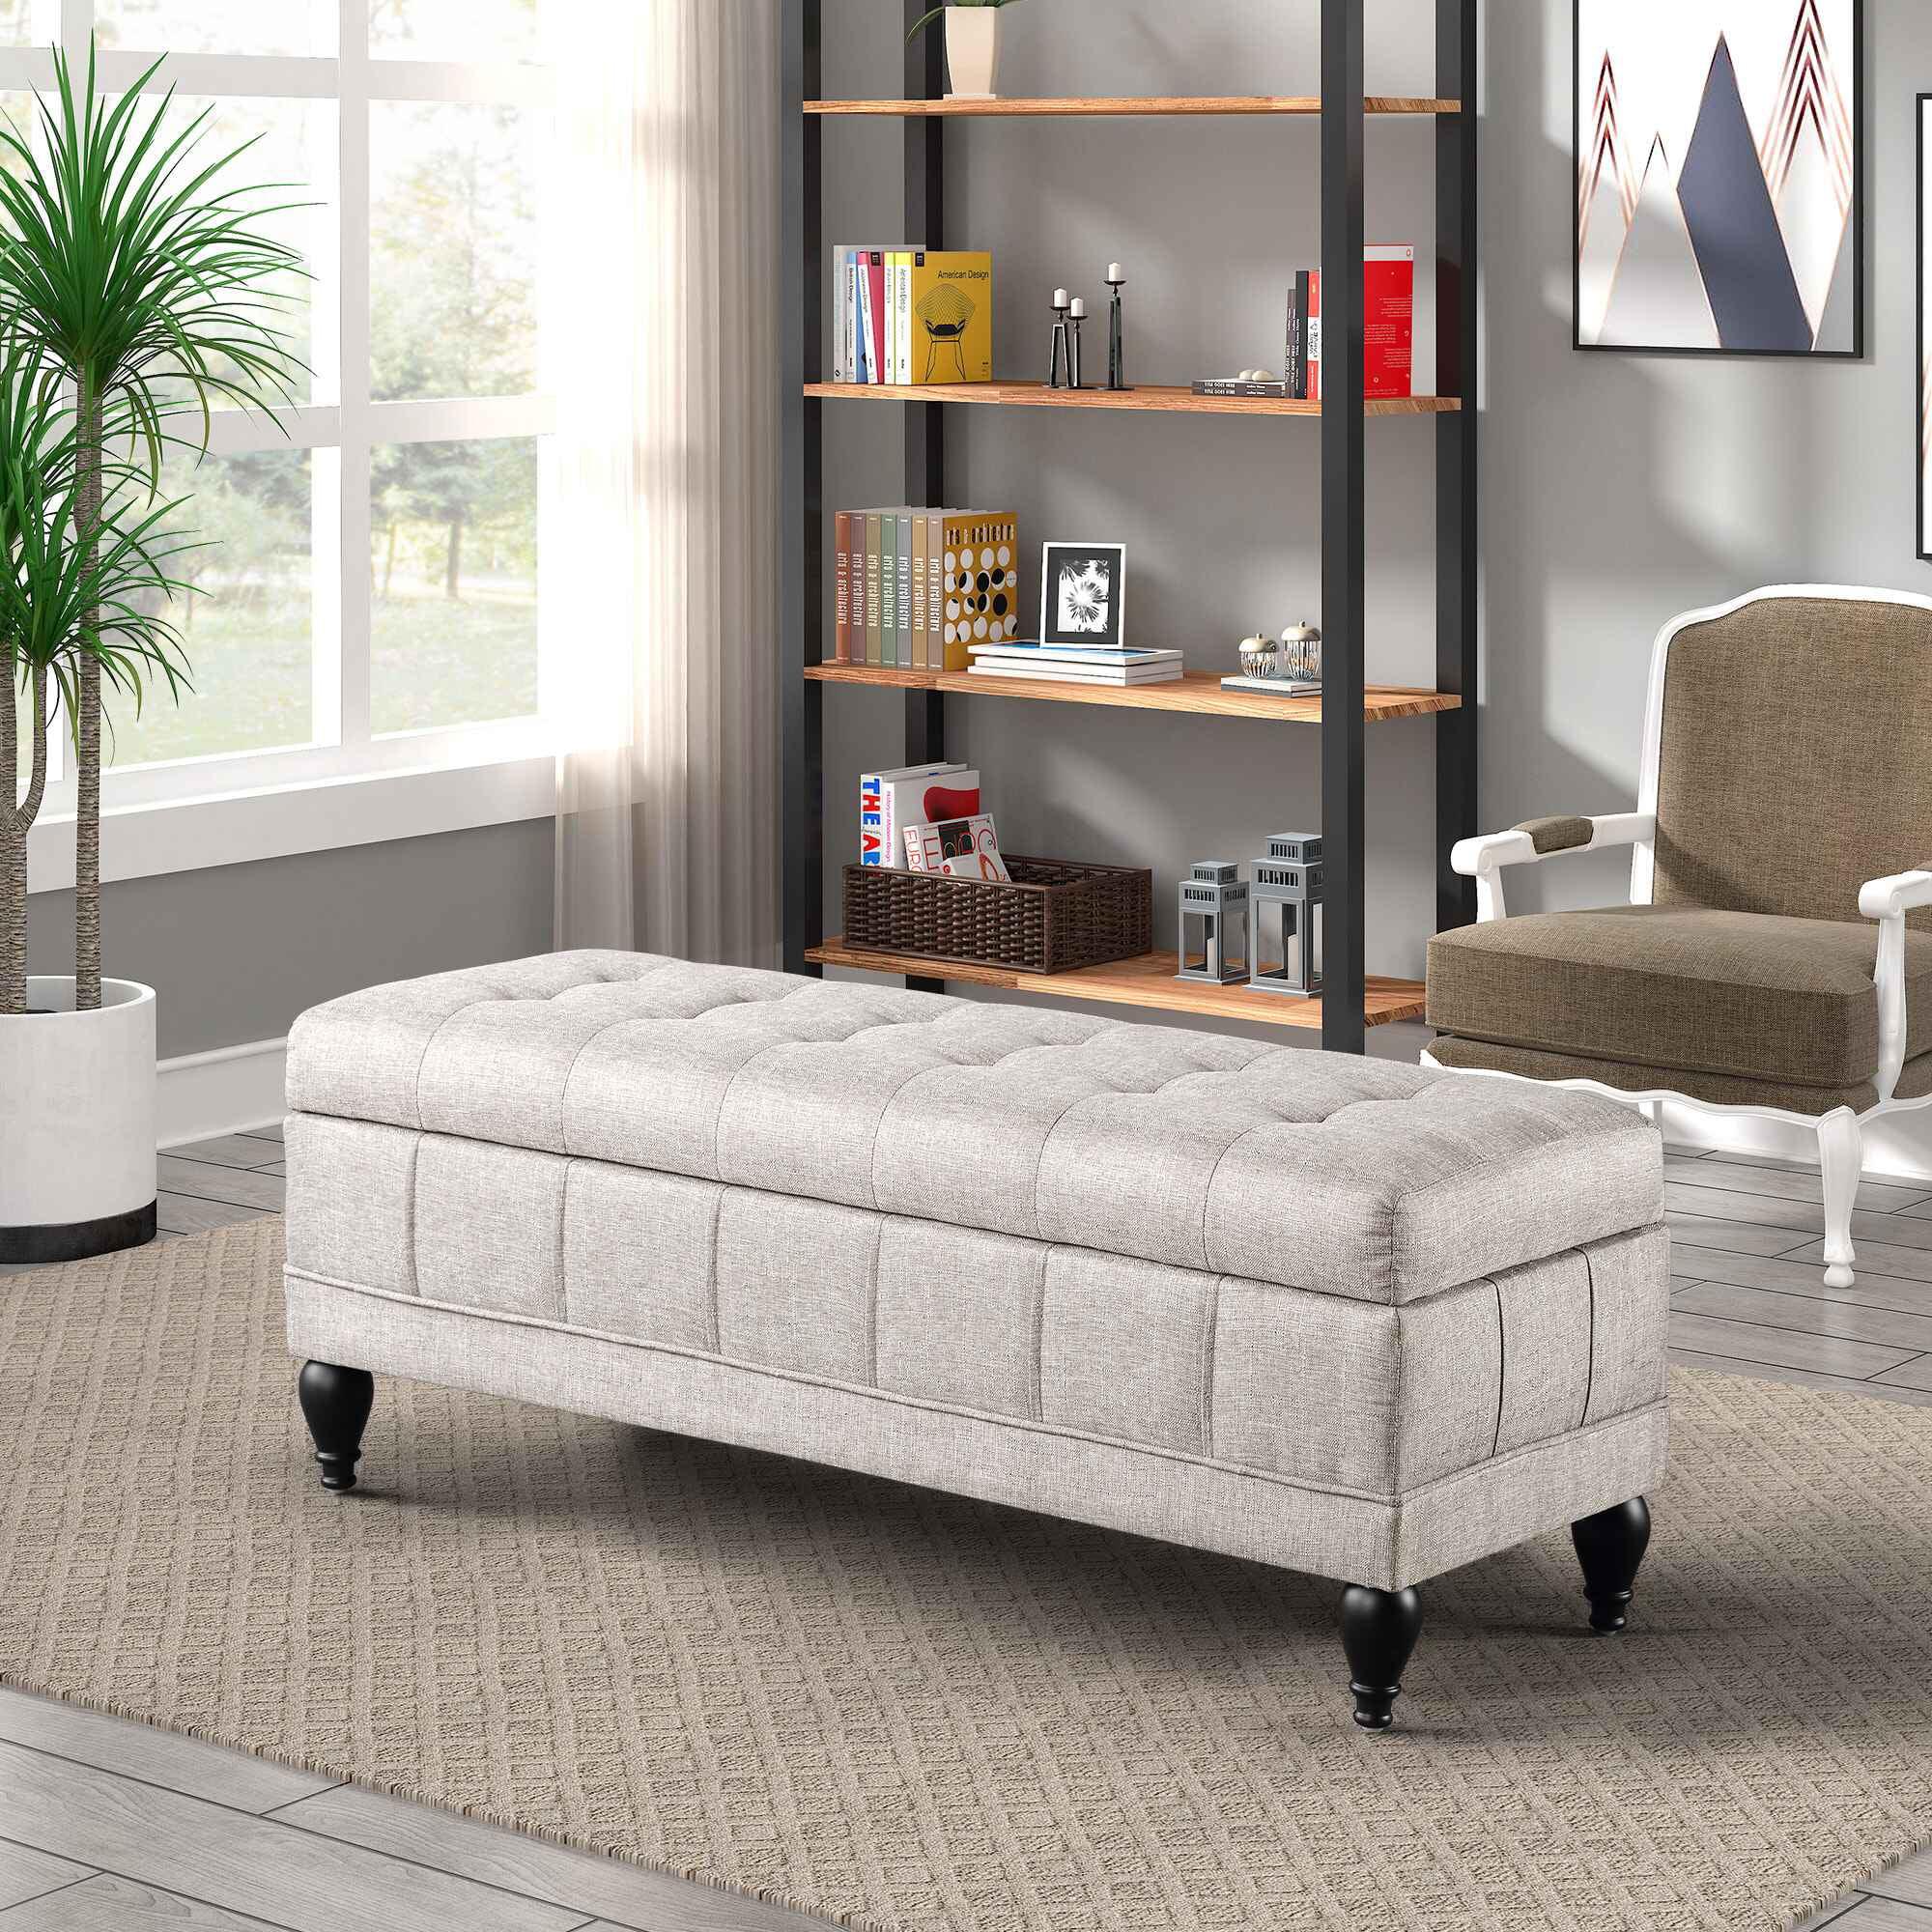 Storage Bench For Bedroom Grey Bedroom Storage Ottoman Bench Upholstered Storage Bench Seat Ottoman Bench With Storage End Of Bed Storage Bench Seat For Bedroom Entryway Bench With Storage R149 Walmart Com